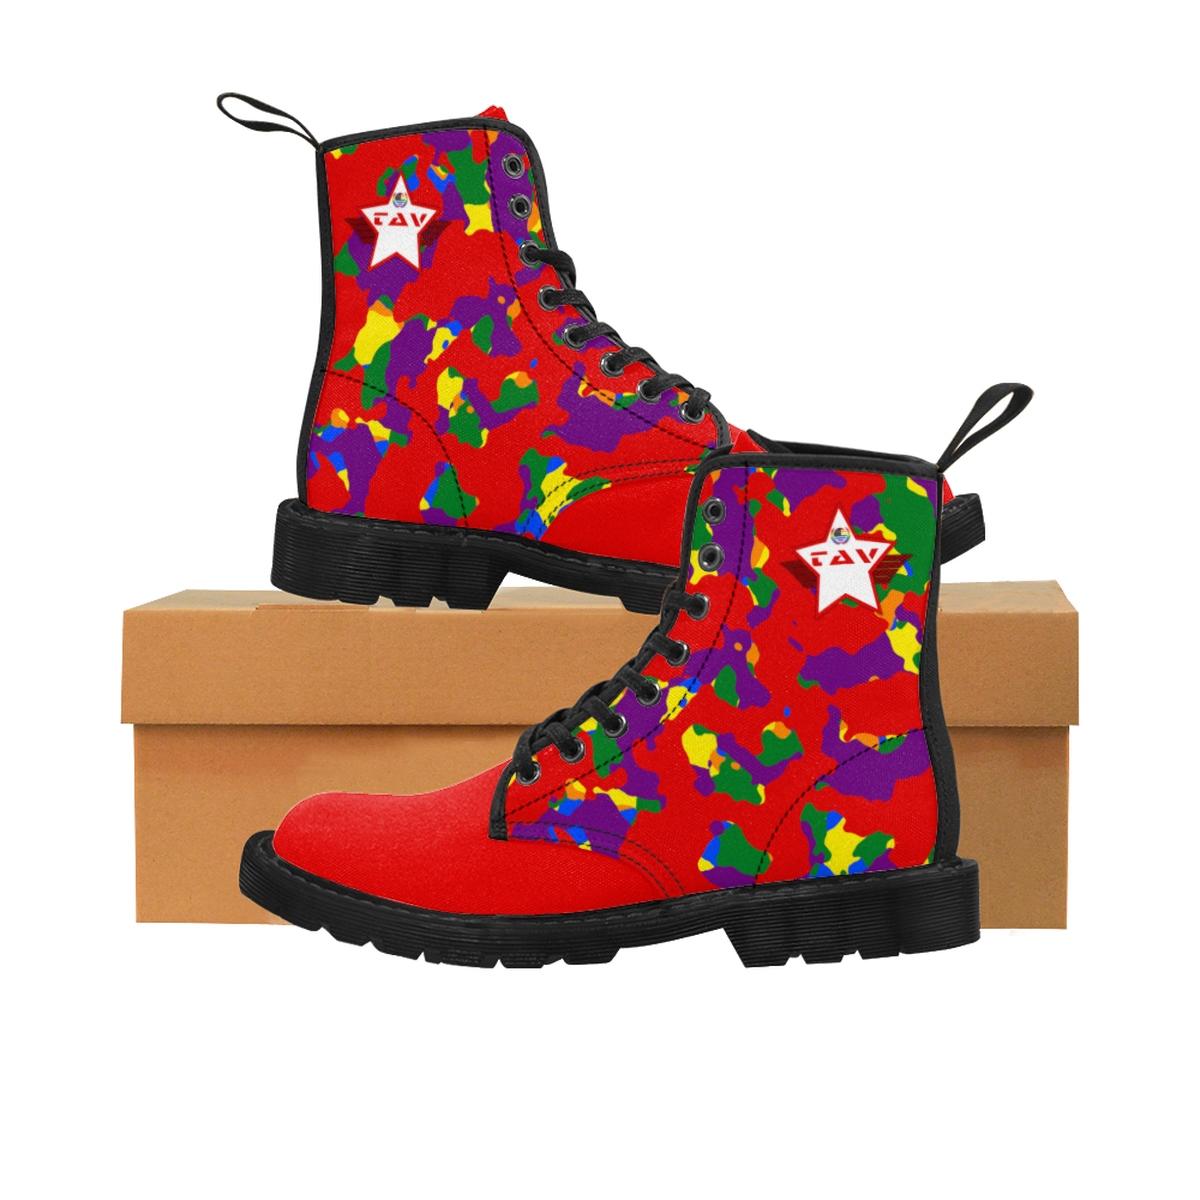 Women's Partial Pride Red Camo & Red Canvas Boots – Red & White TAV Pride Shield